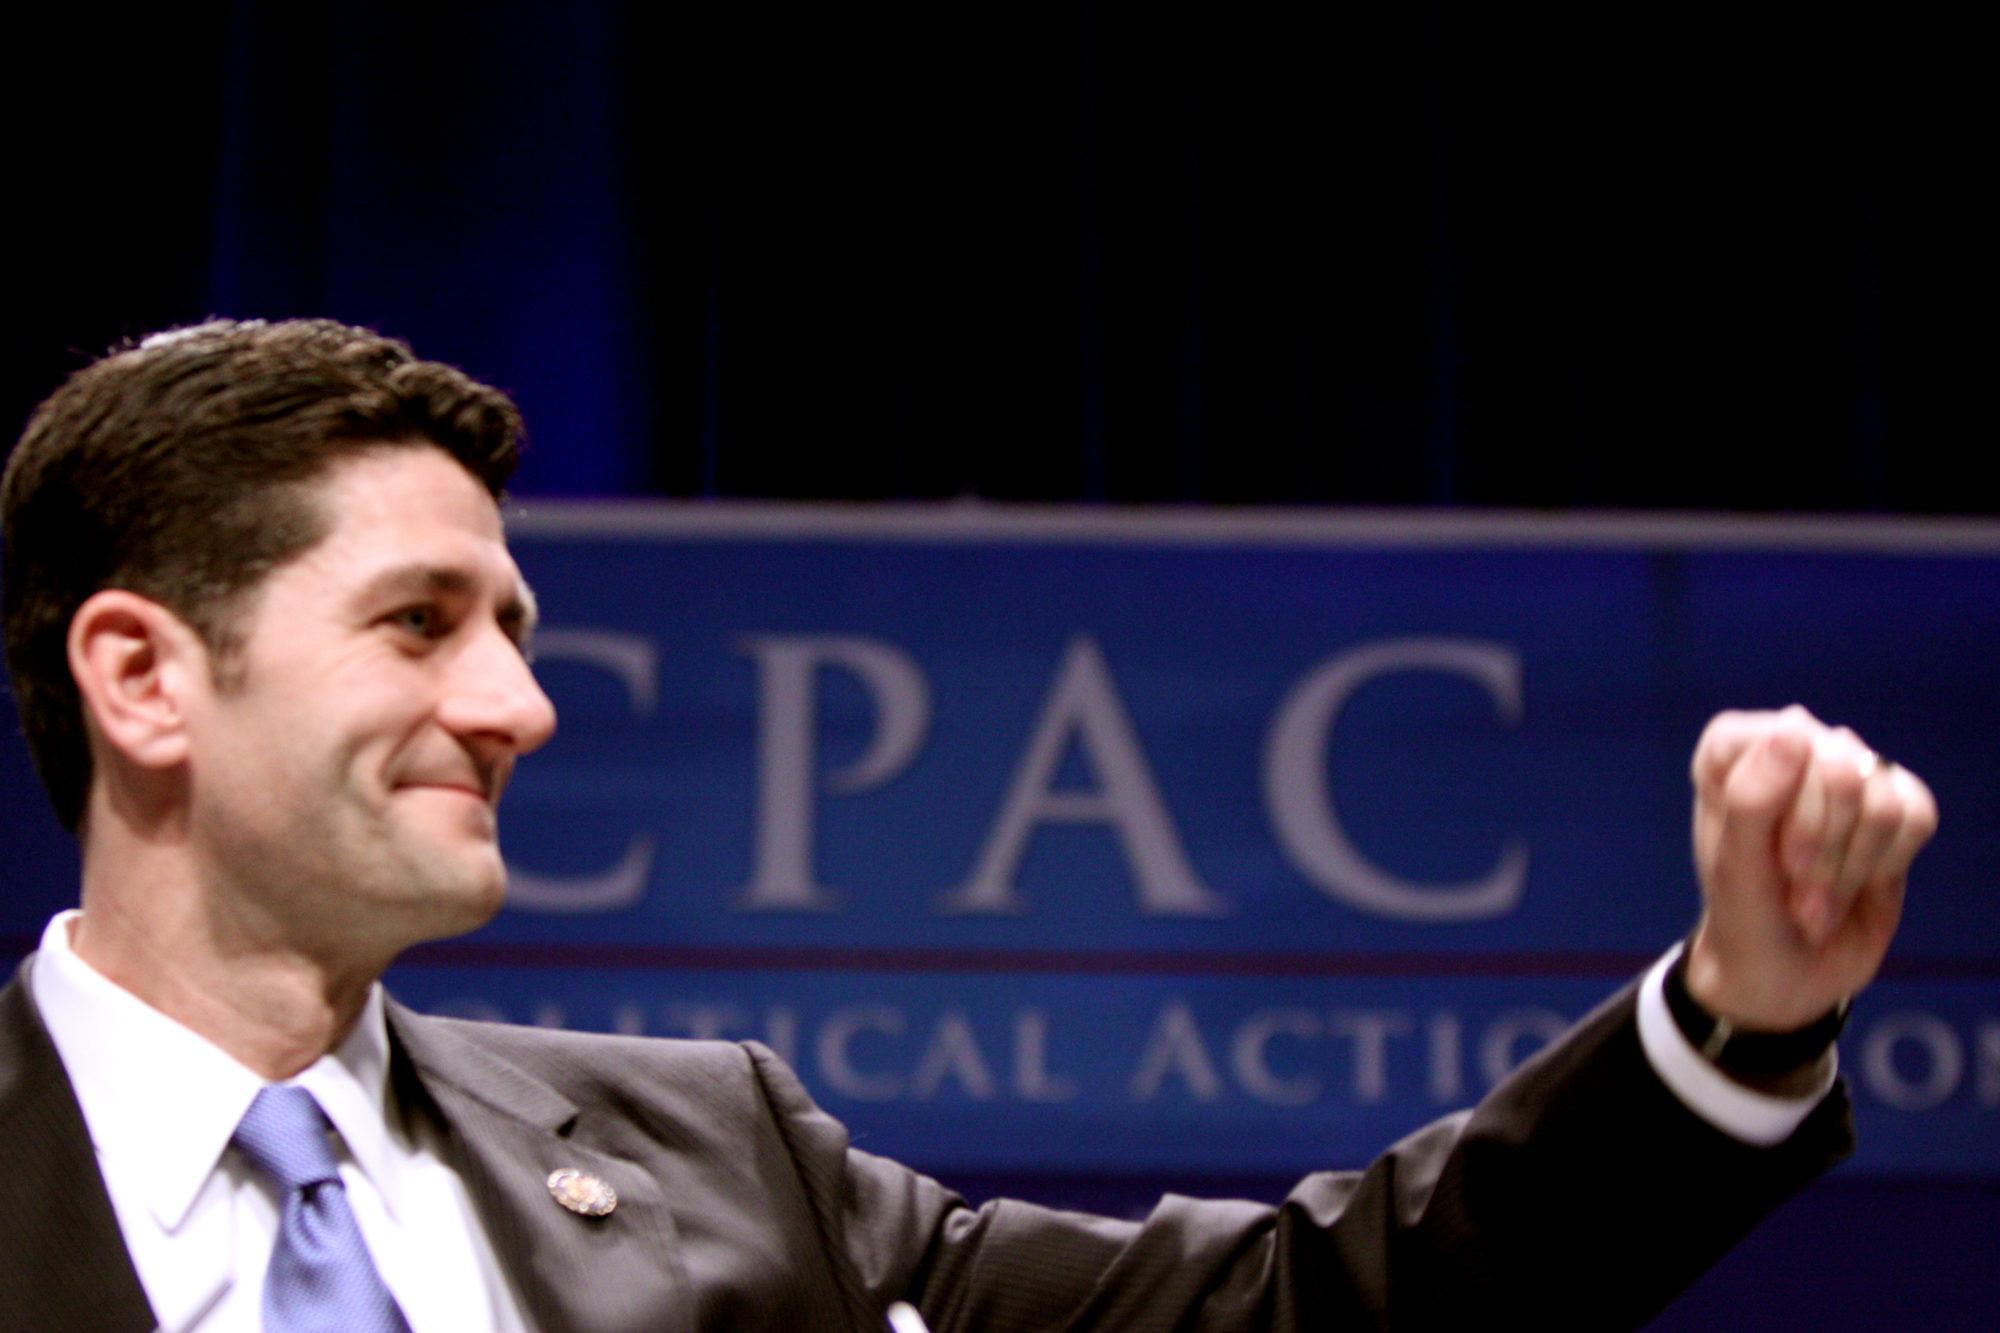 Did Paul Ryan Say That 'Women Using Birth Control Commit Murder'?